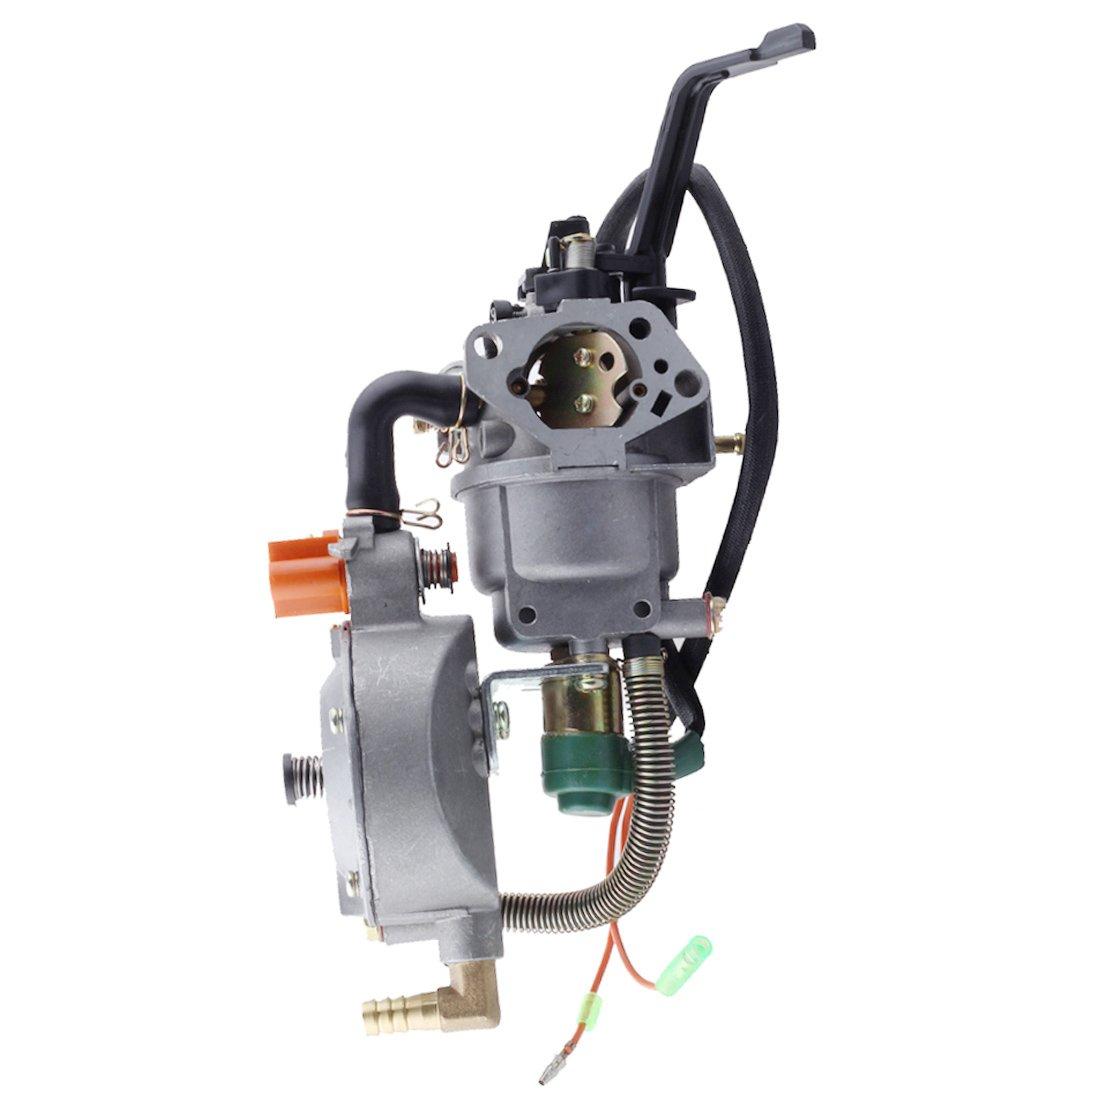 HIPA Generator Dual Fuel Carburetor LPG CNG Conversion kit 4.5-5.5KW GX390 188F Manual Choke